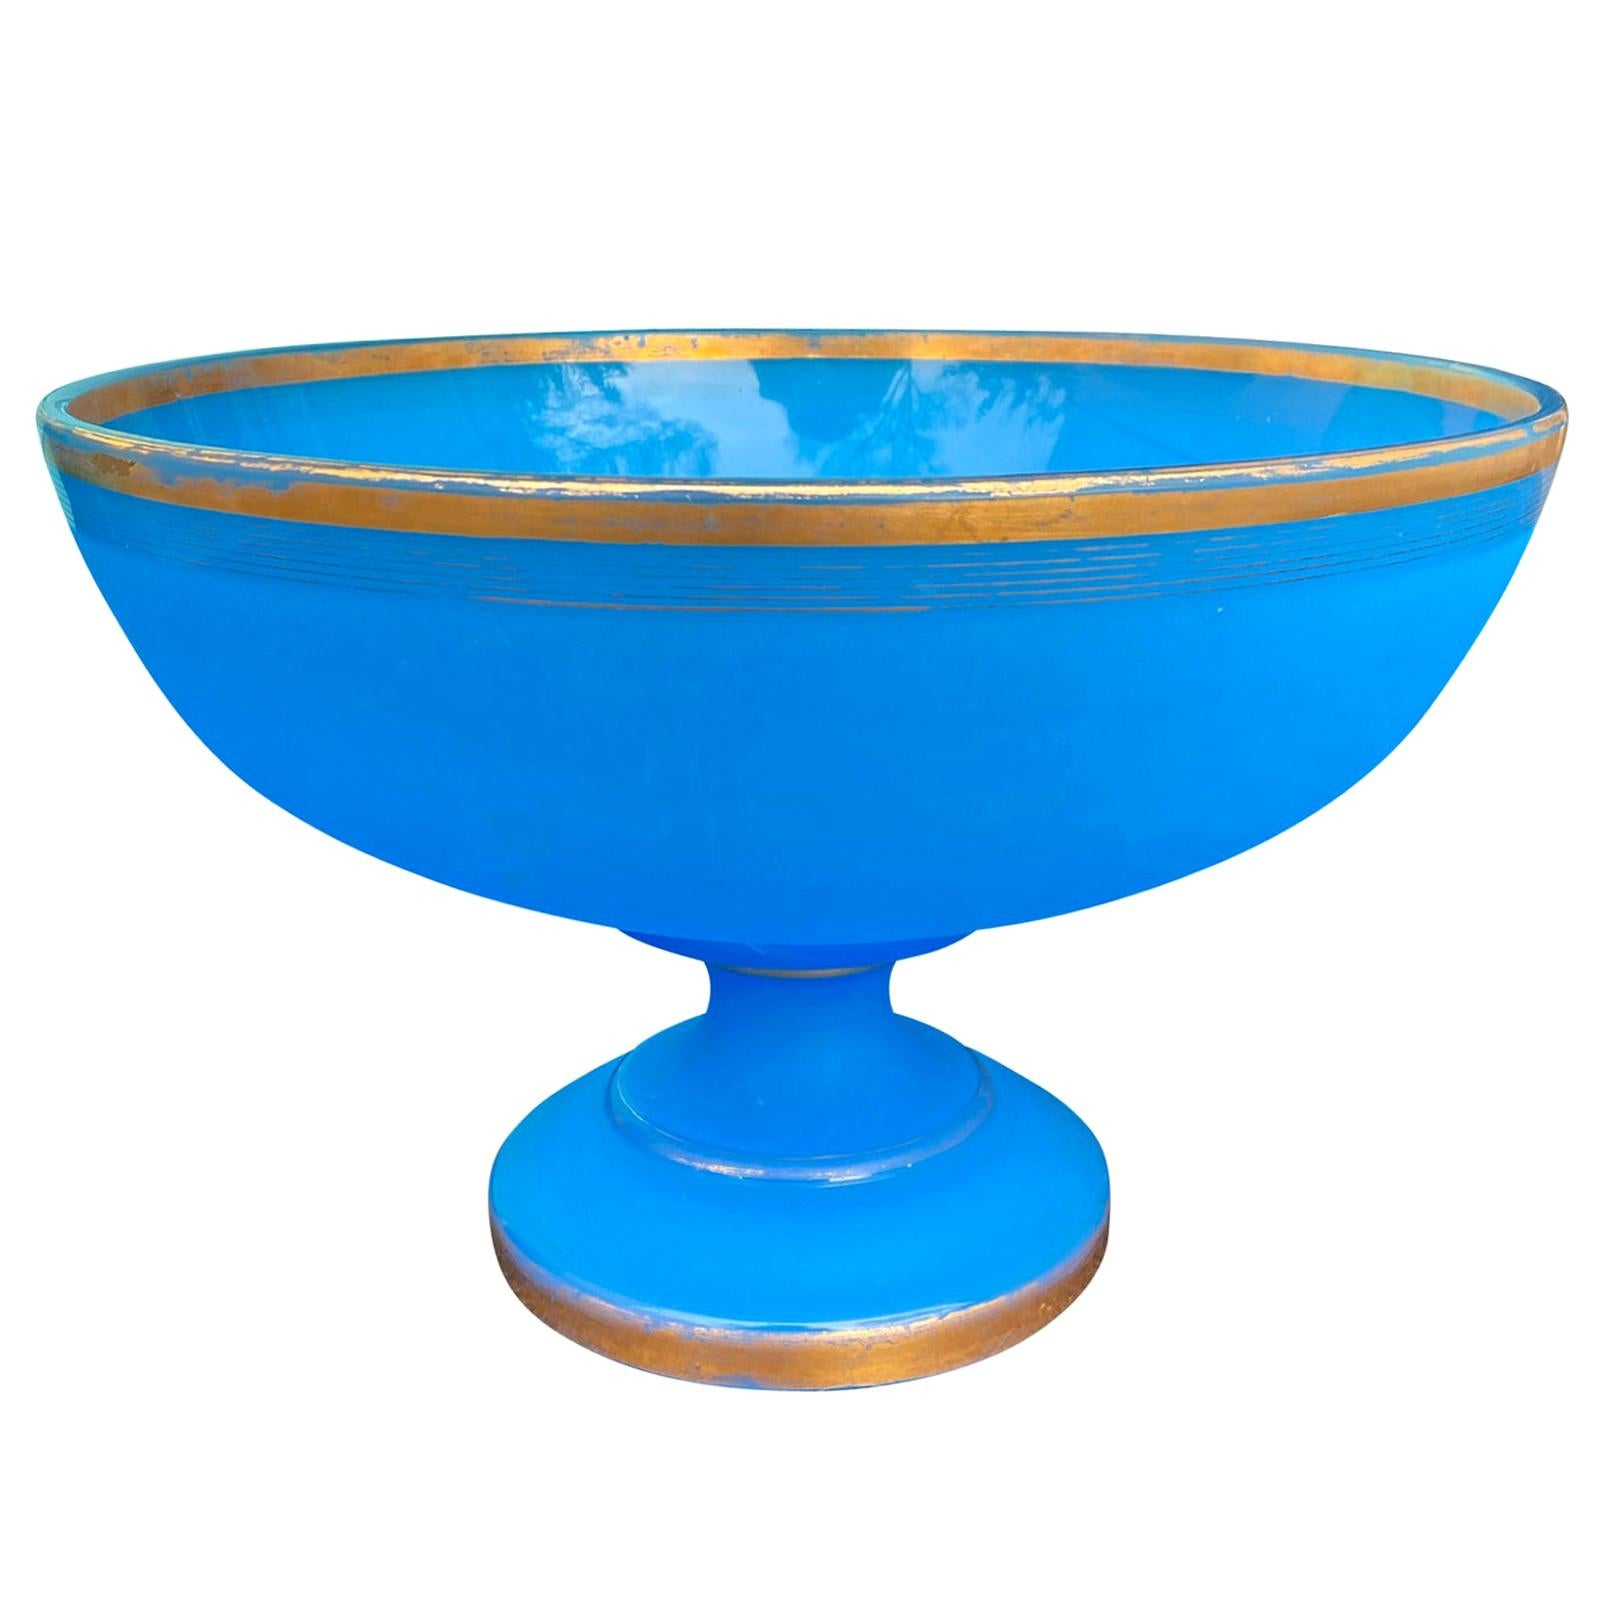 19th Century Blue Opaline Glass Round Centerpiece or Bowl with Gilt Edges